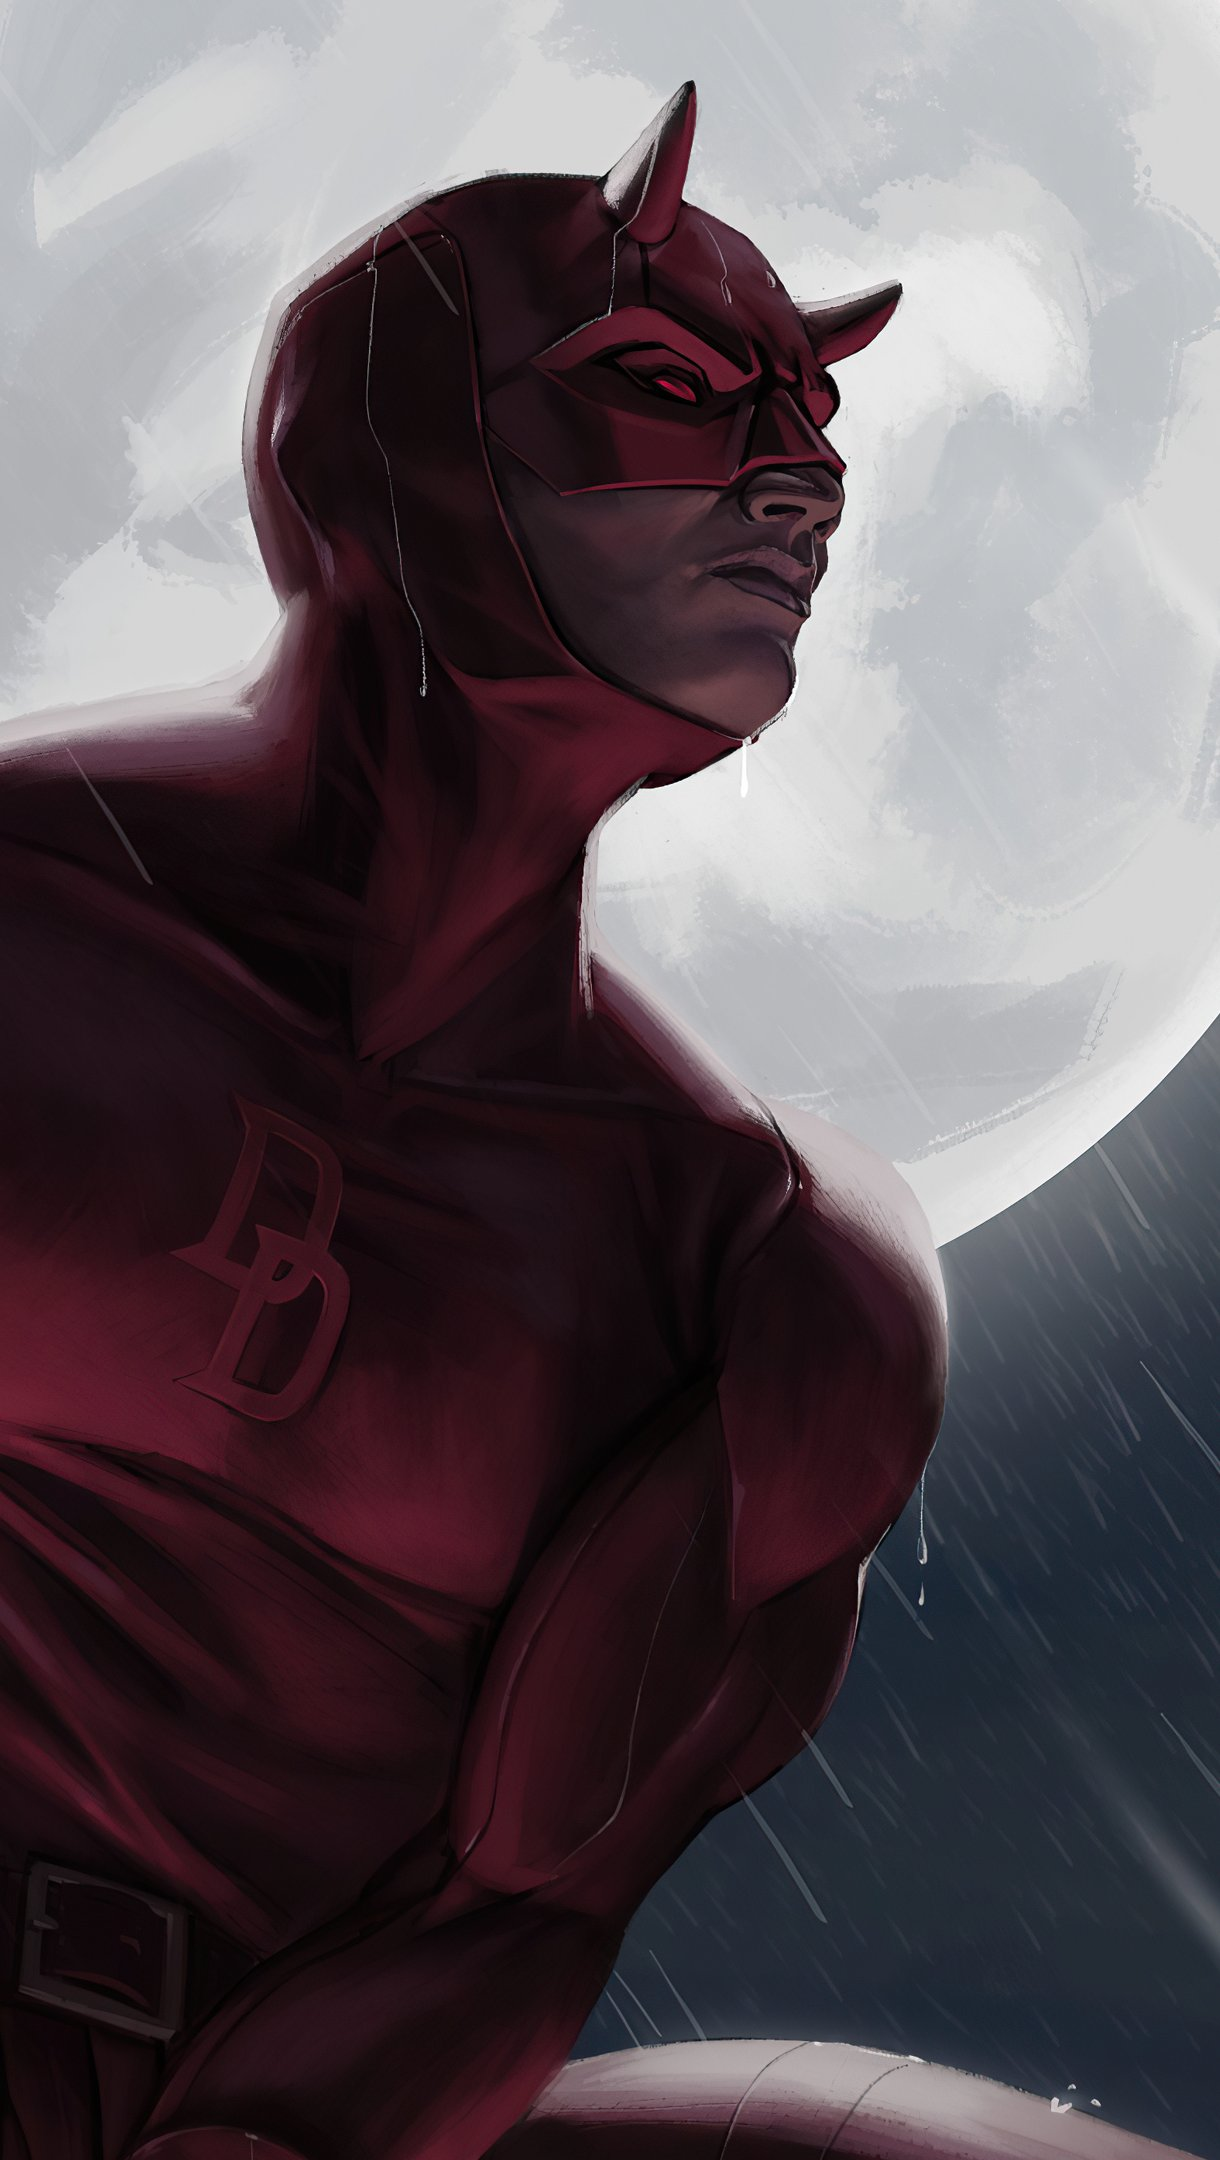 Fondos de pantalla Daredevil a la luz de la luna Vertical